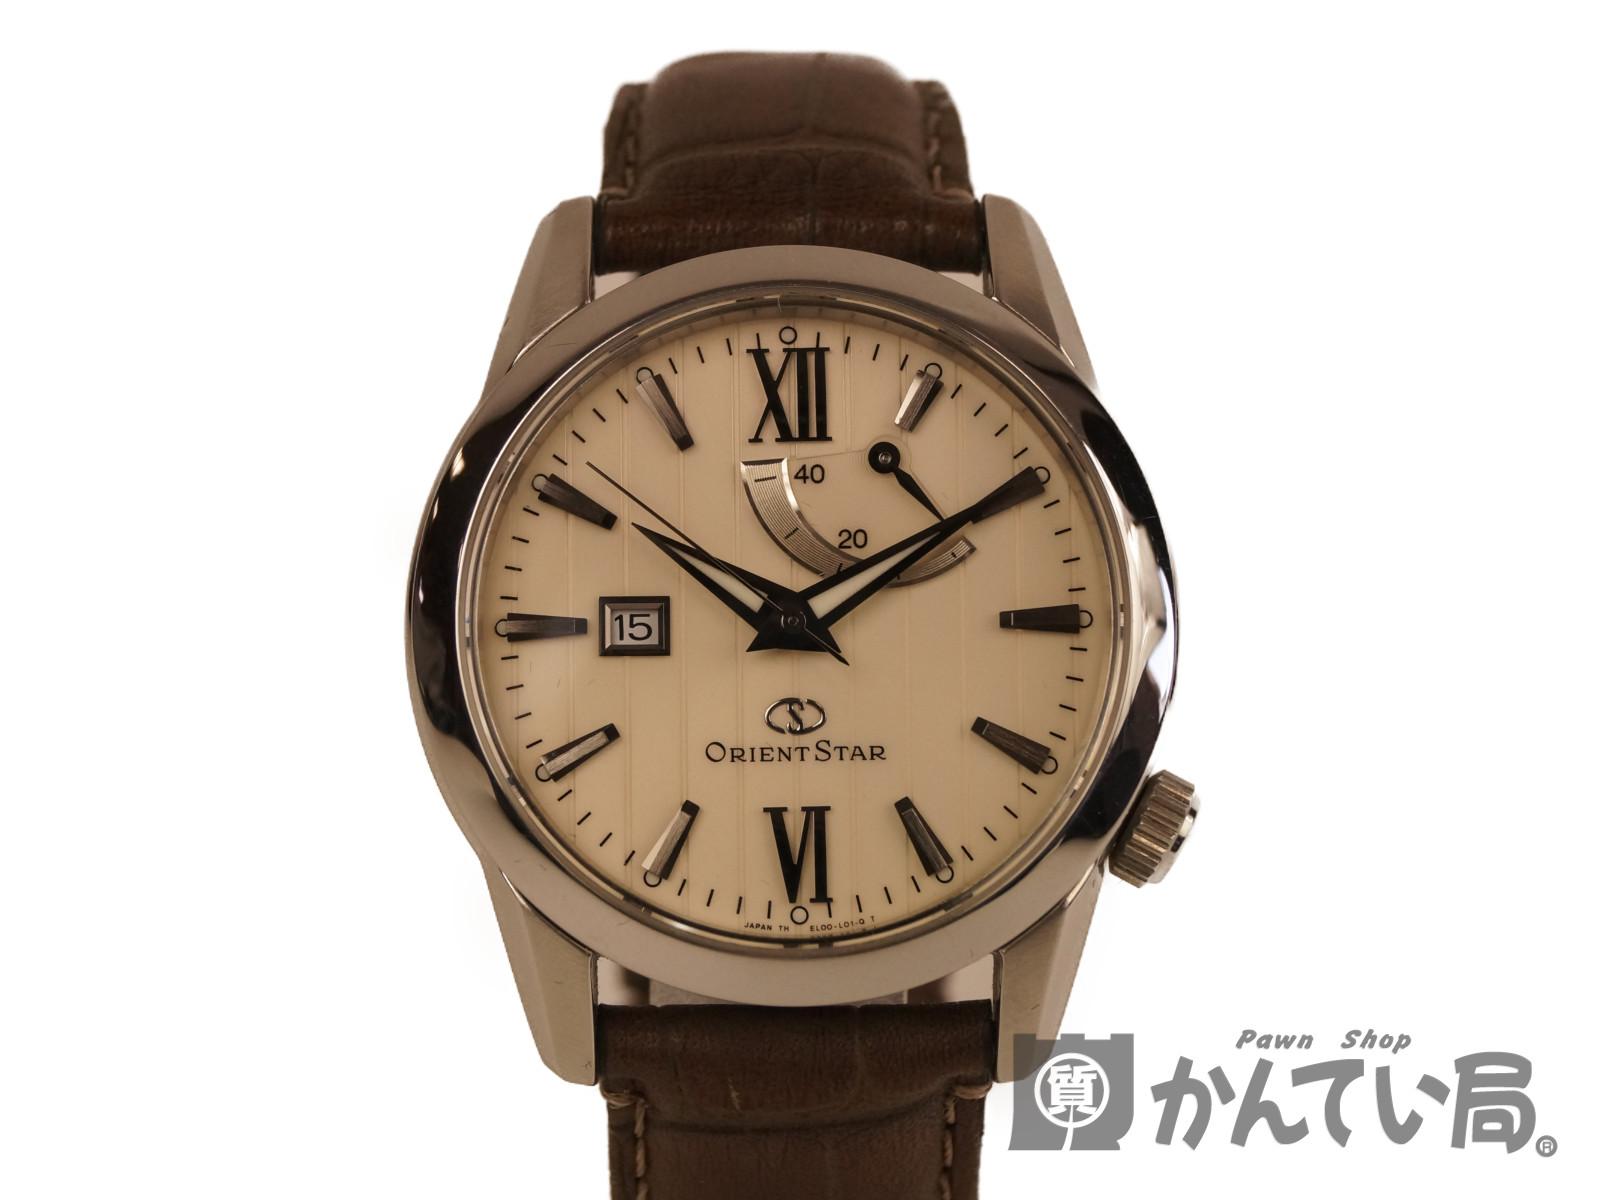 【ORIENT STAR】オリエントスター メンズ腕時計 WZ0361EL 自動巻き 【中古】F68-6251 USED-A かんてい局本社